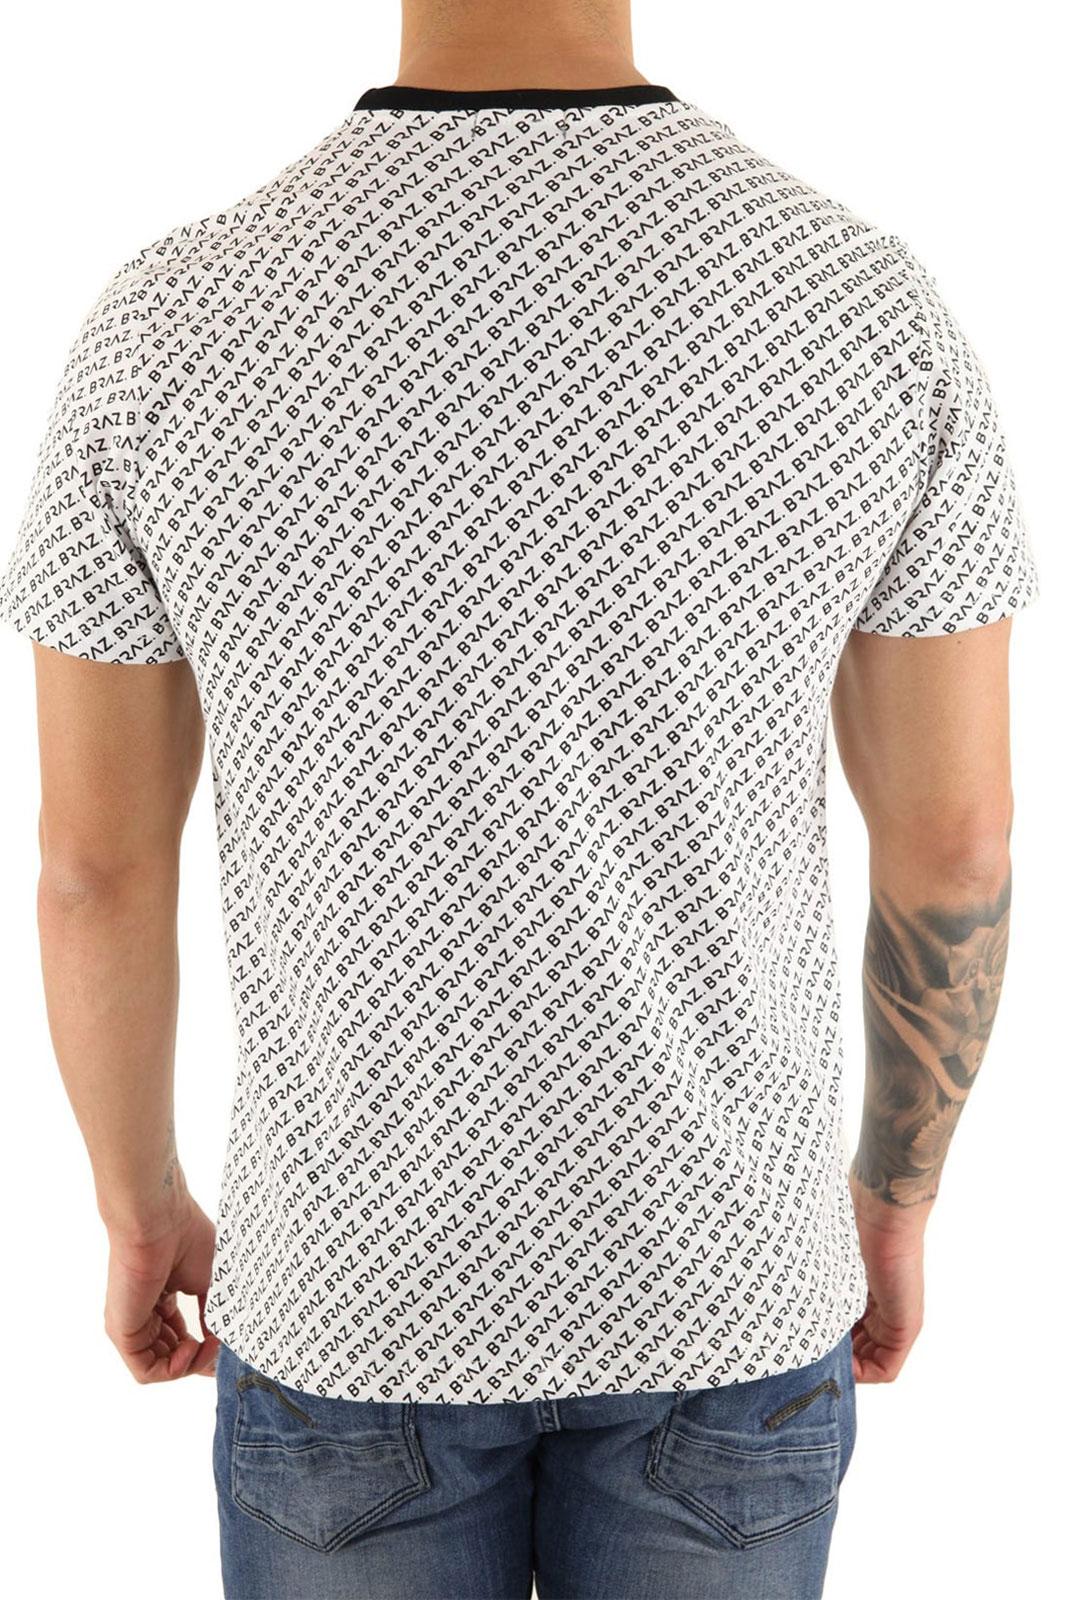 Tee-shirts  Braz T-SHIRT BR 213229 WHITE